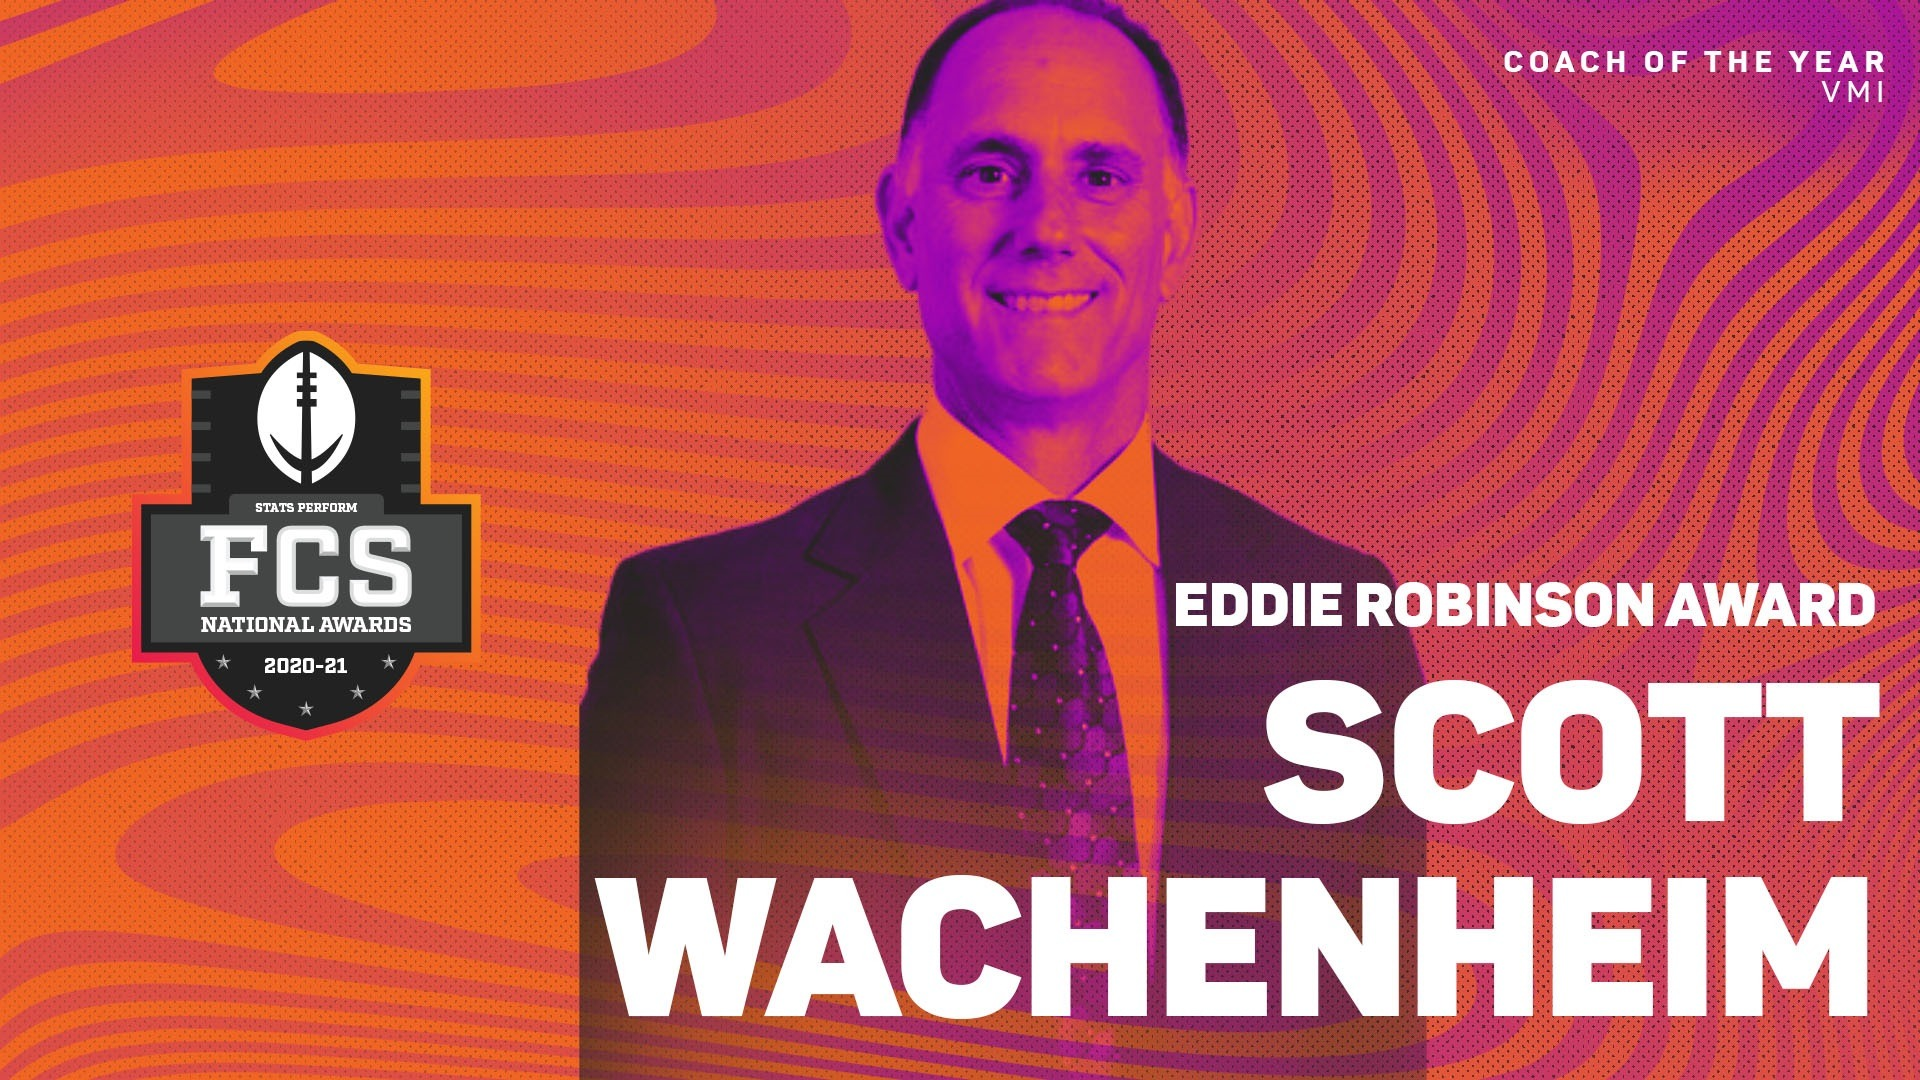 VMI's Scott Wachenheim Selected 34th Eddie Robinson Award Winner as FCS Coach of the Year